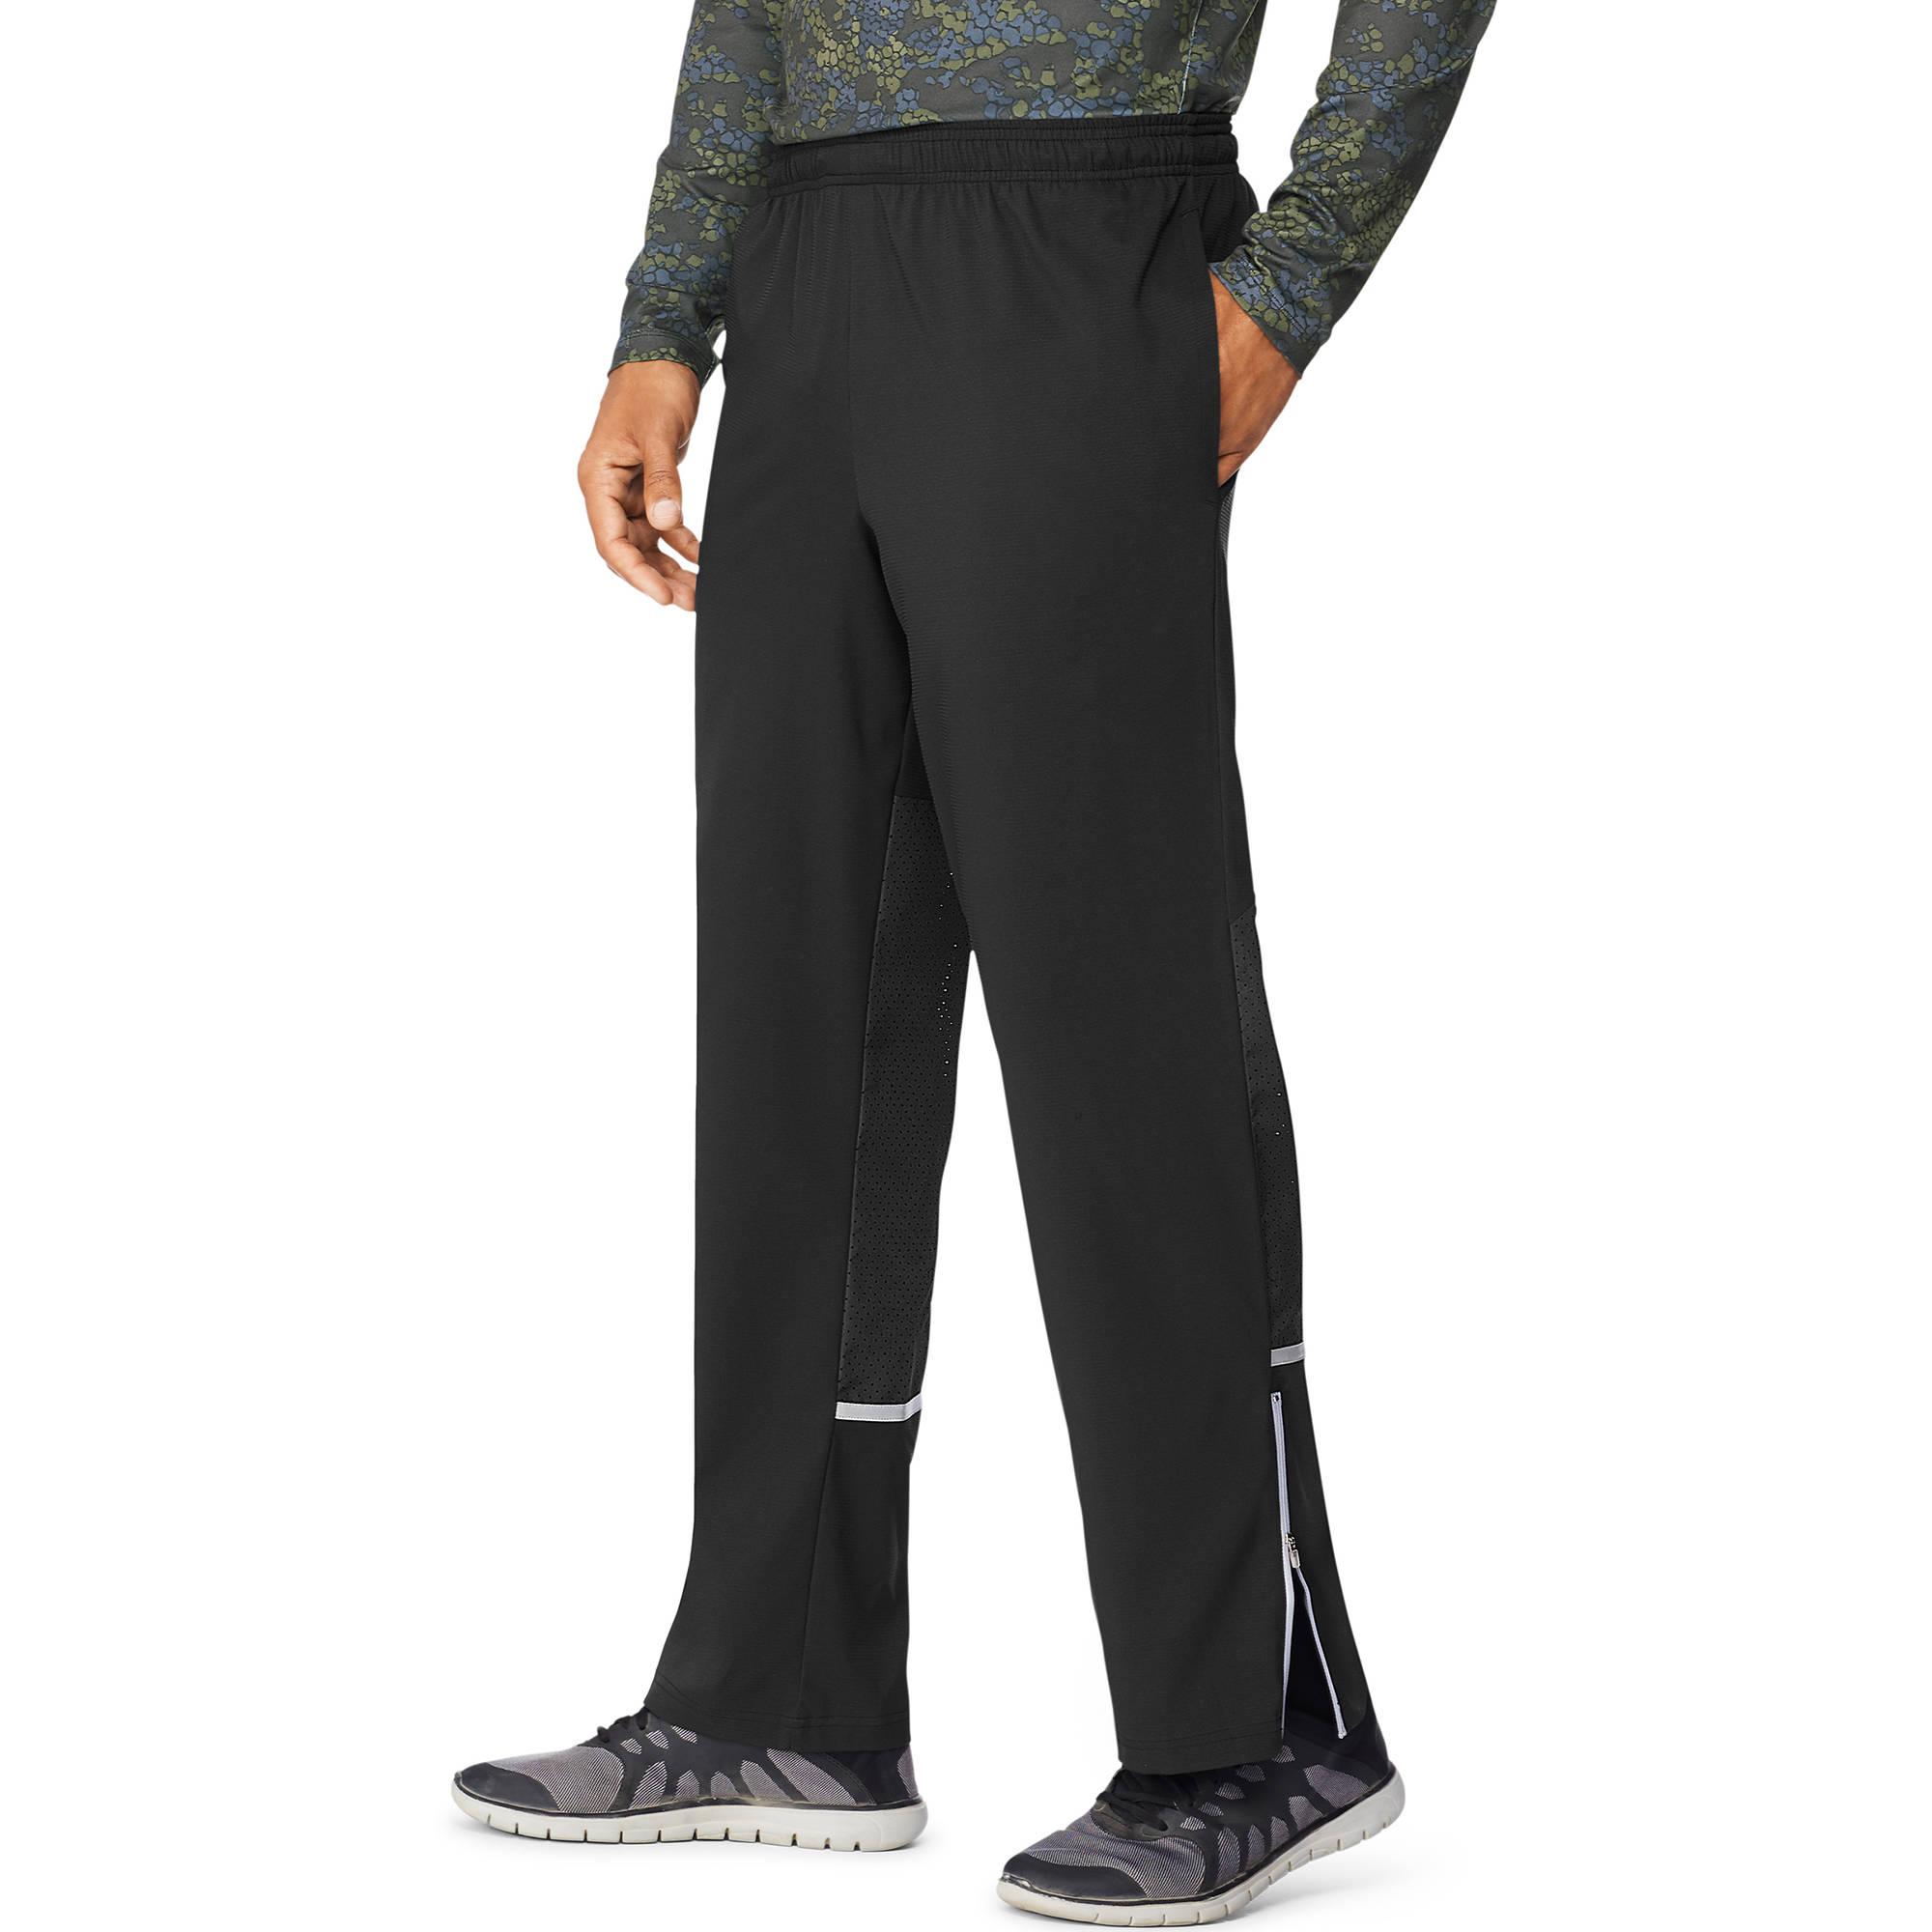 Sport Men's Performance Running Pants